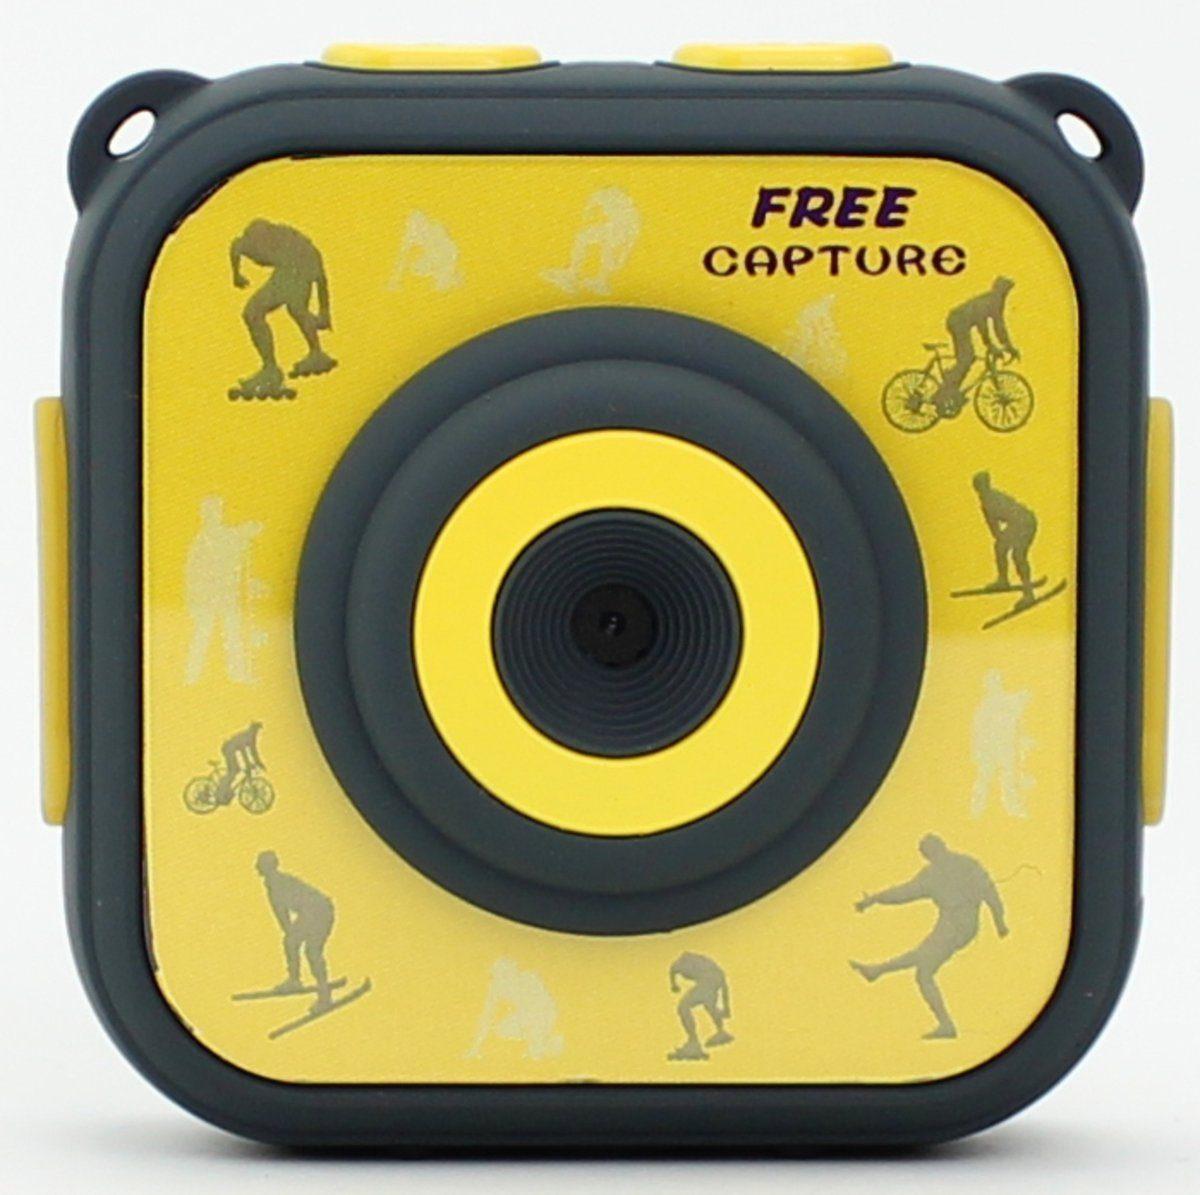 Denver Actioncam »Kinder Actioncam - ACT-1303«